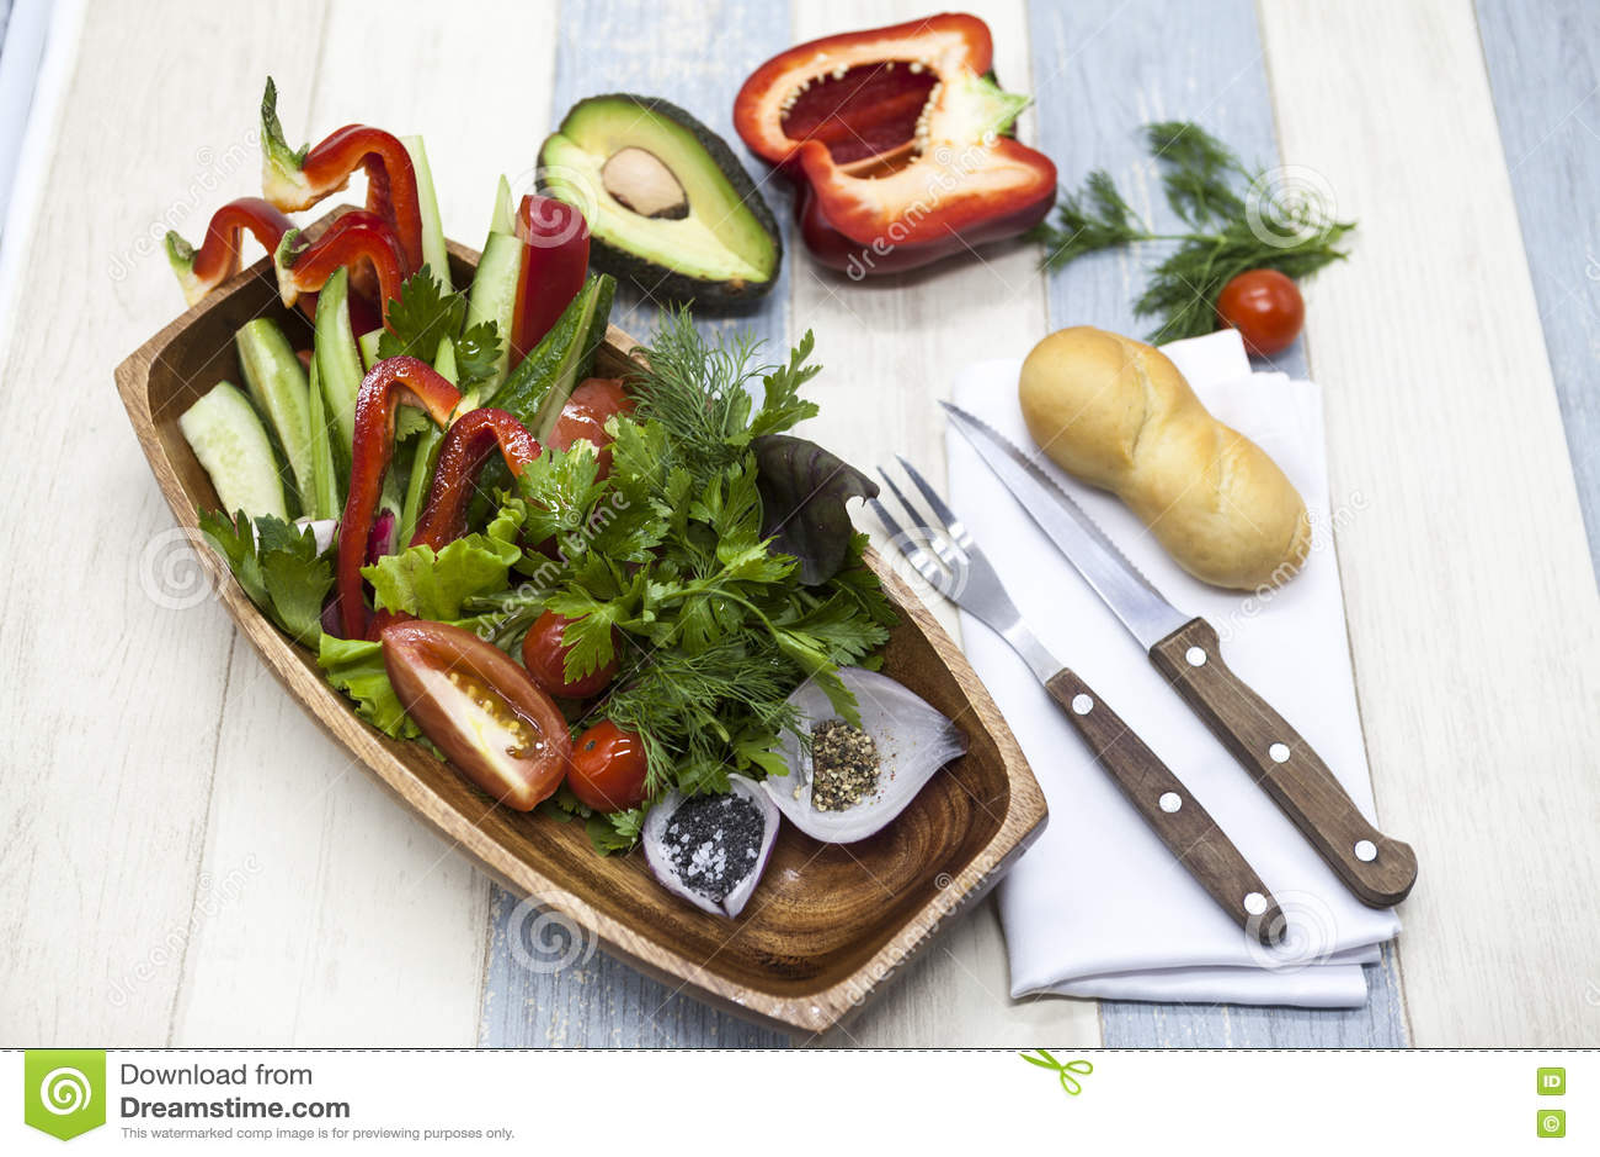 dieta del pepino y perejil